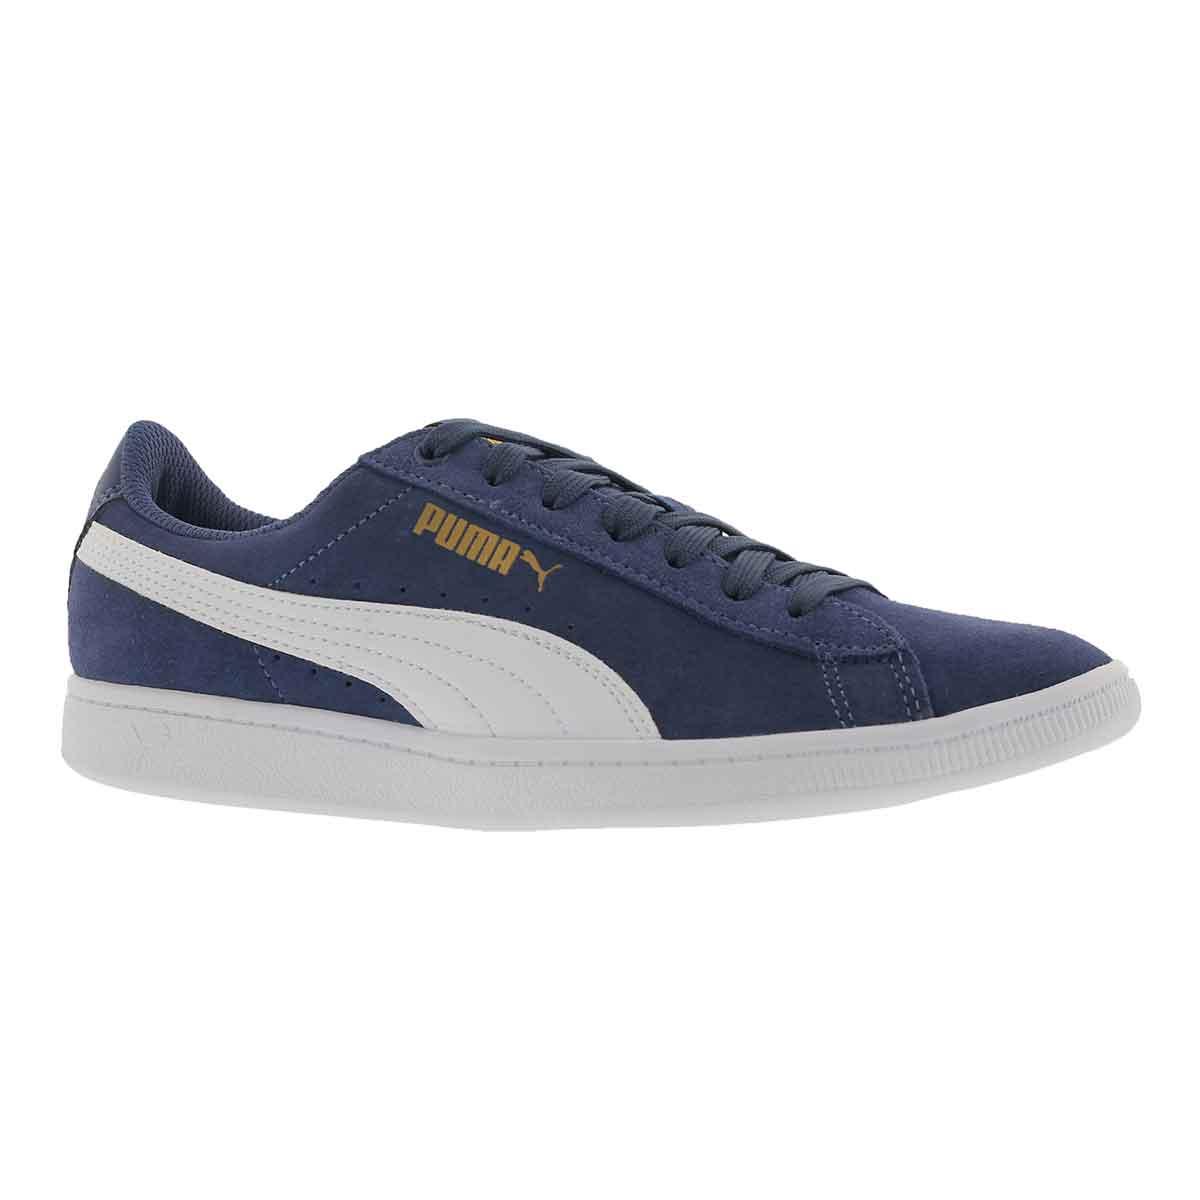 Women's PUMA VIKKY blue indigo sneakers